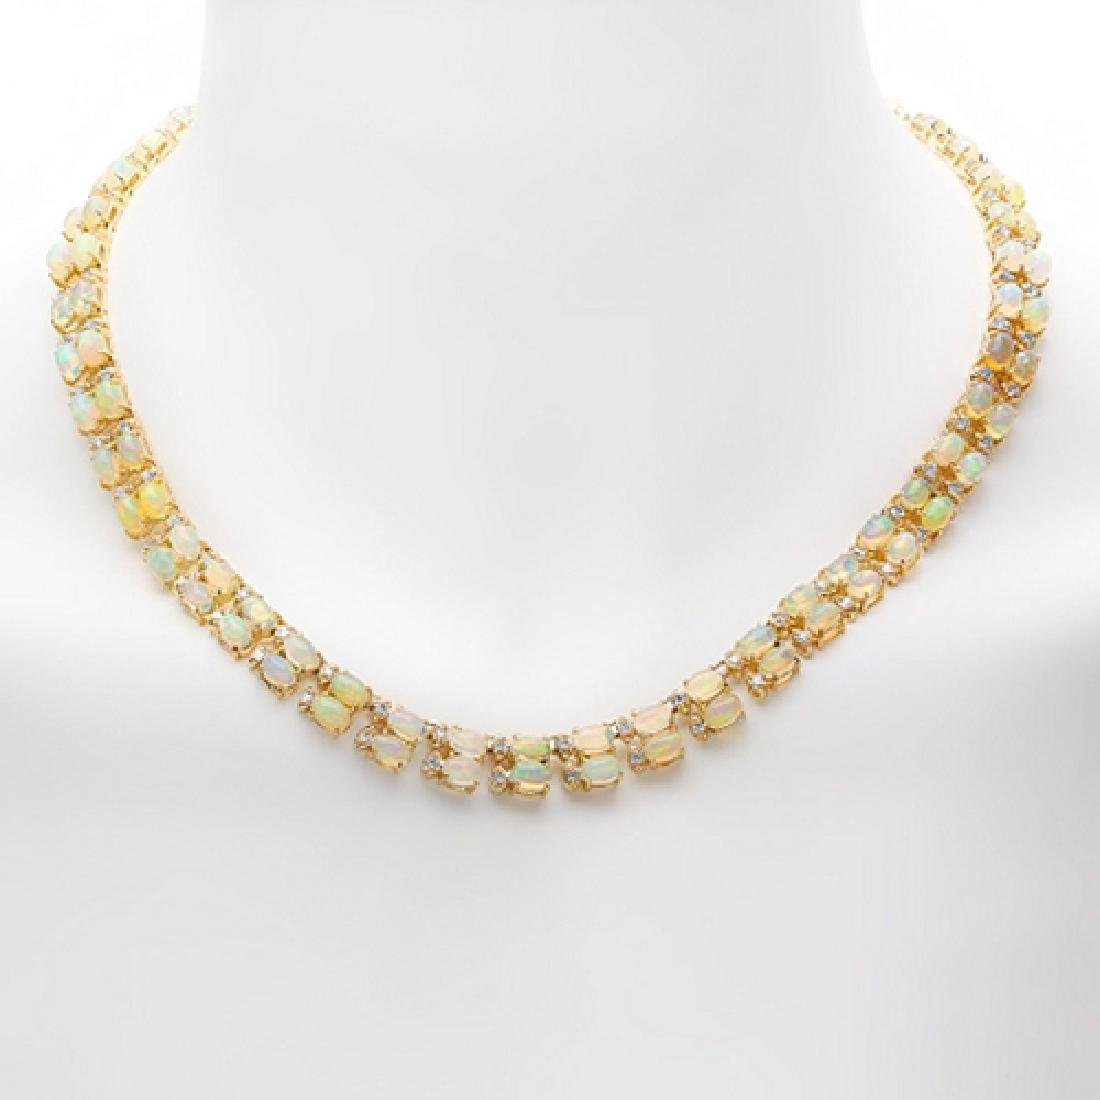 33.77 Carat Natural Opal 18K Solid Yellow Gold Diamond